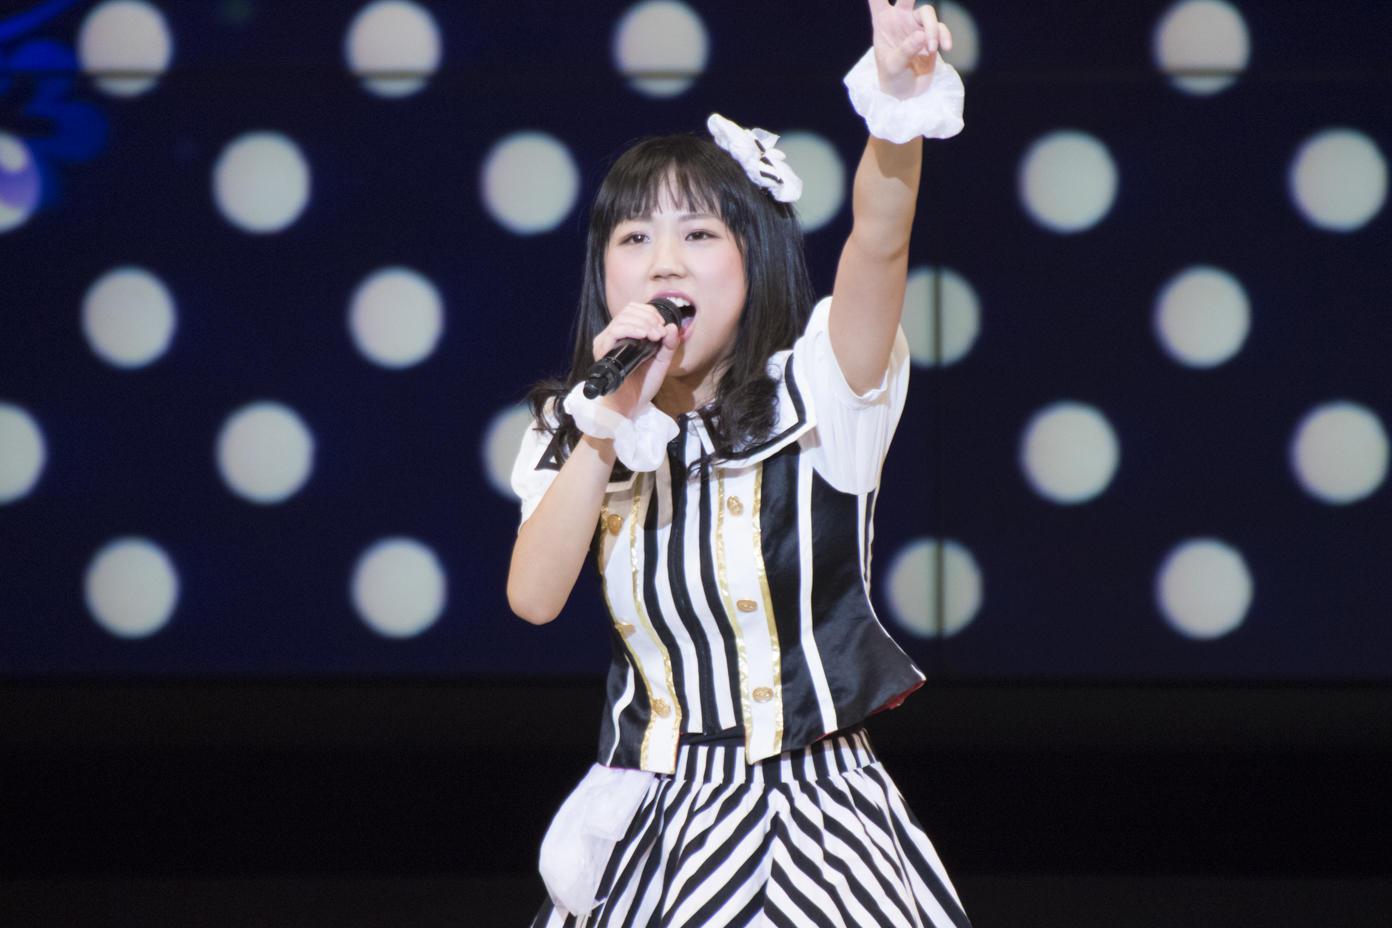 http://news.yoshimoto.co.jp/20161228153302-0fb166d3304895e81a44f88d185add7f554d7318.jpg